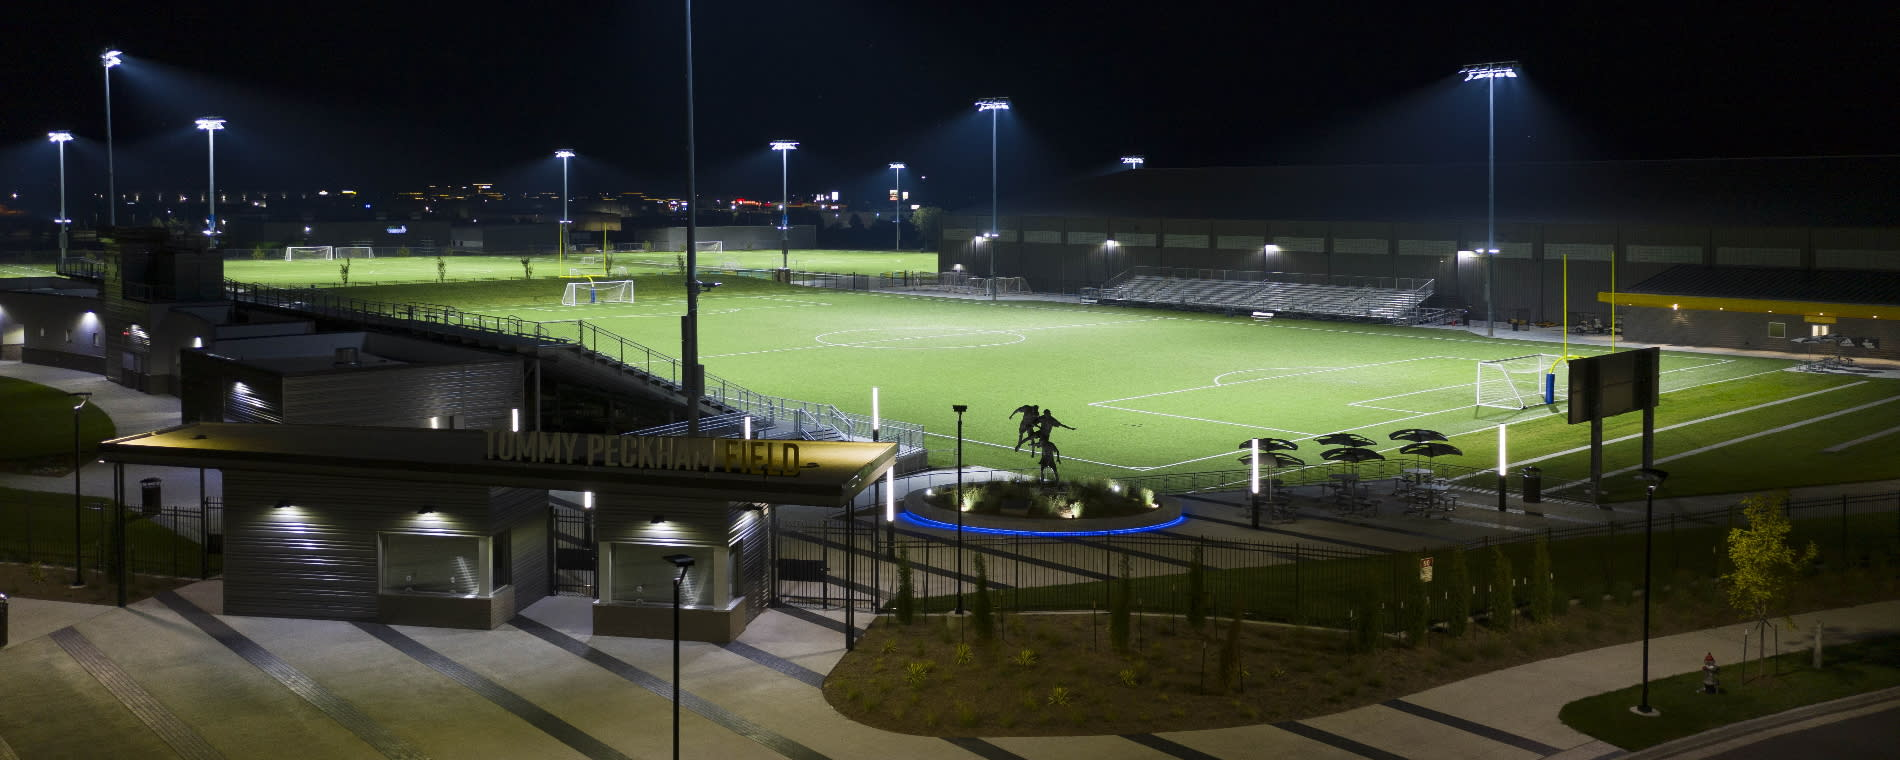 Stryker Sports Complex Tommy Peckham Field